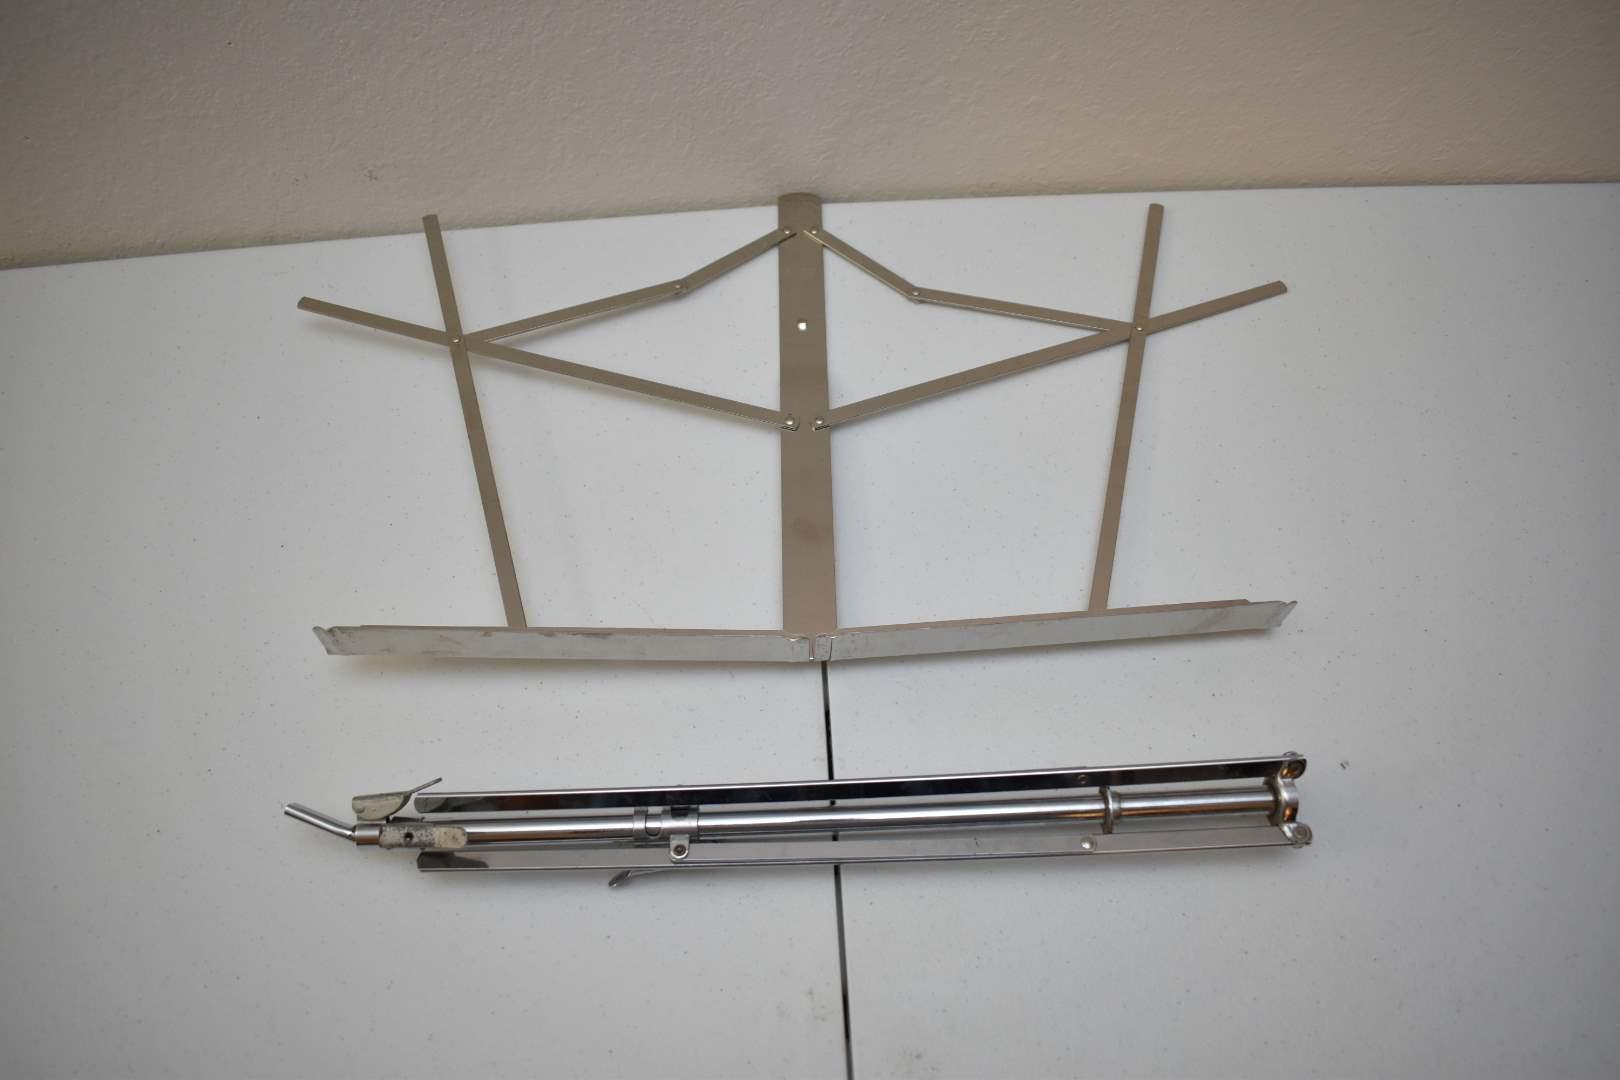 Selmer Folding Music Stand (silver)